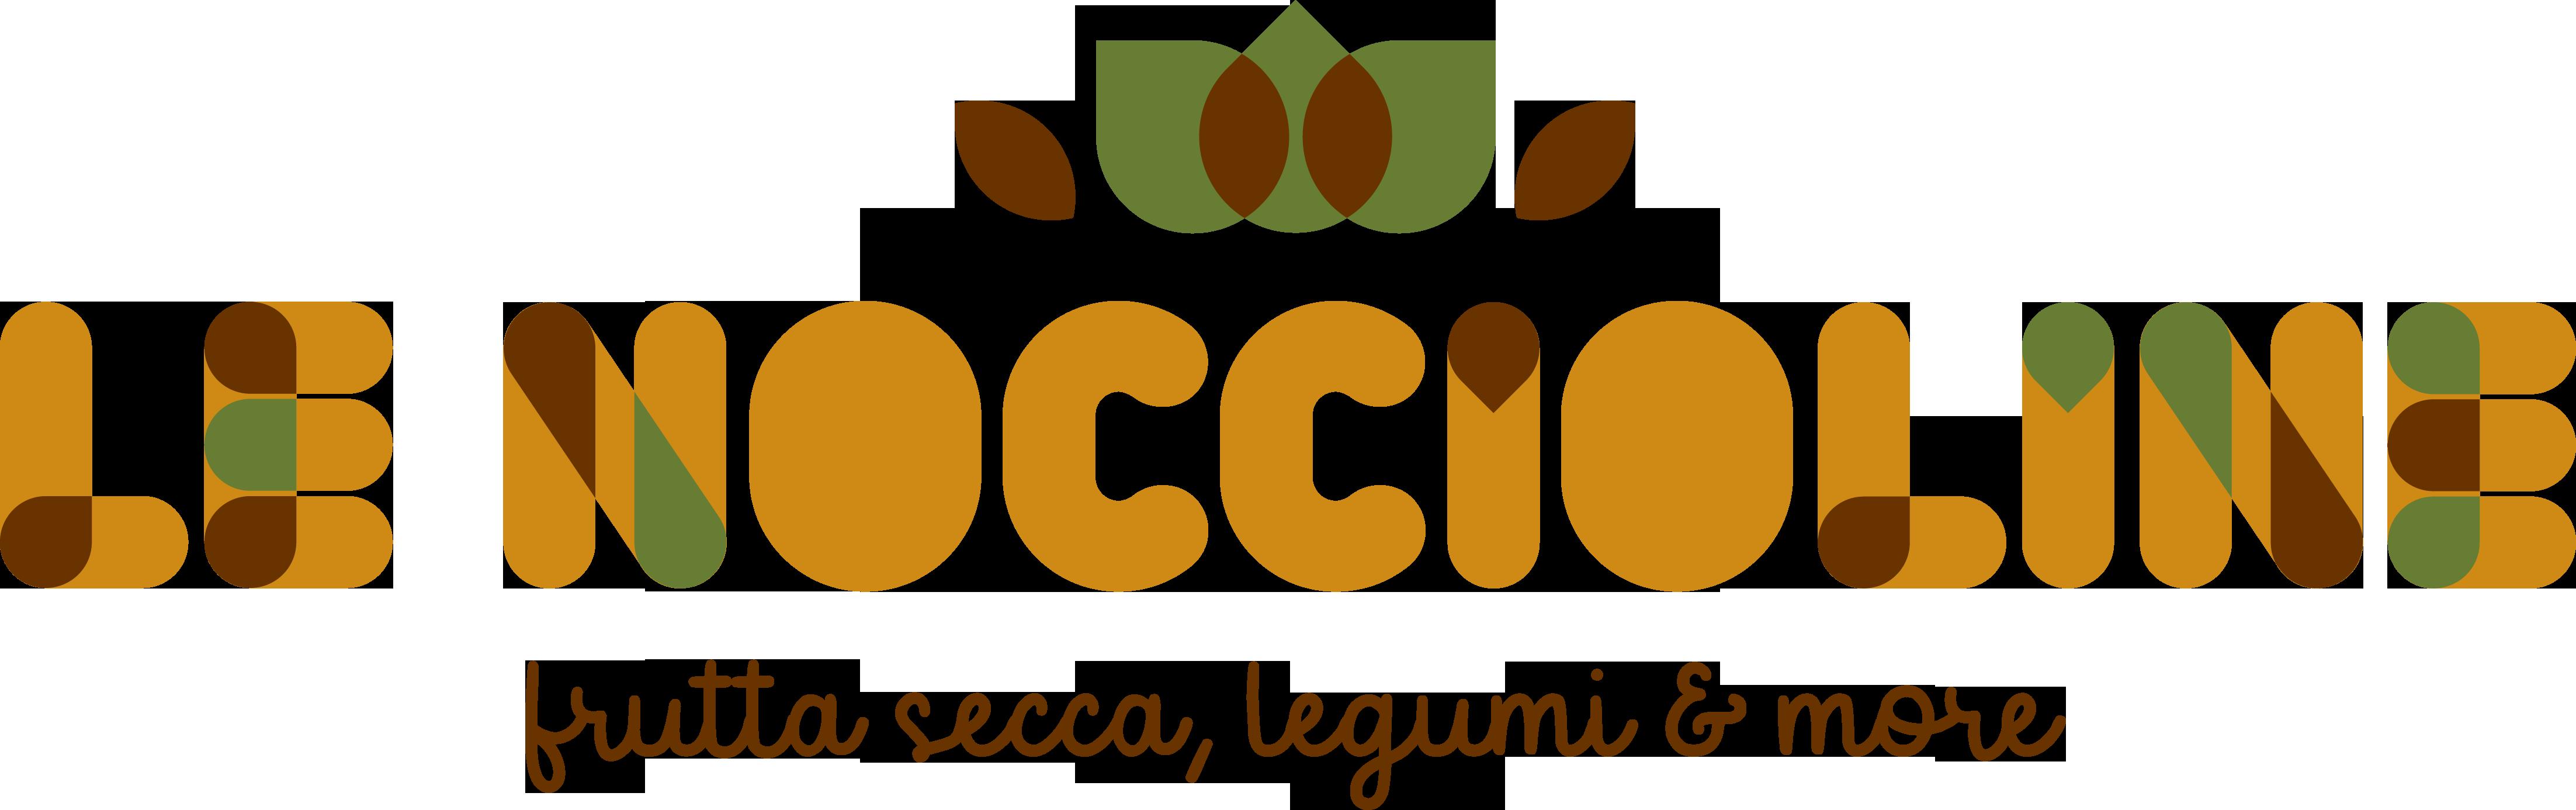 Logo orizzontale 2